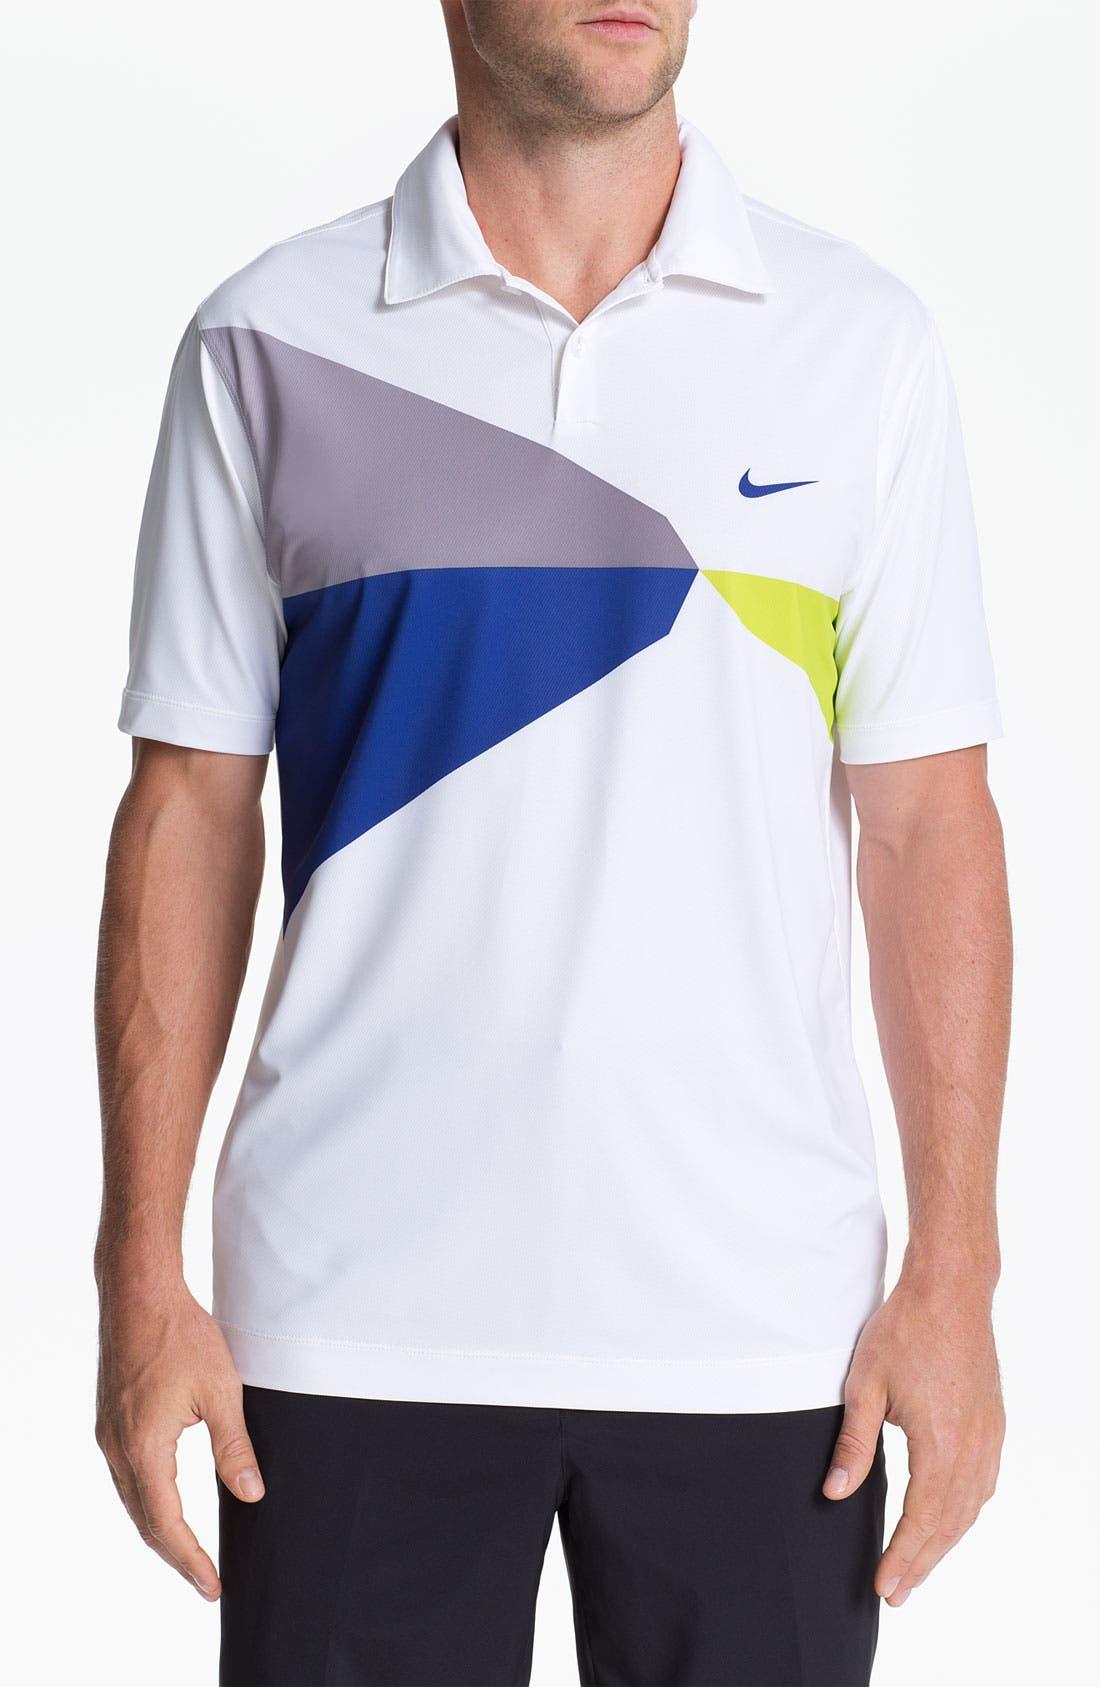 Alternate Image 1 Selected - Nike Golf 'Geo Printed' Dri-FIT Polo